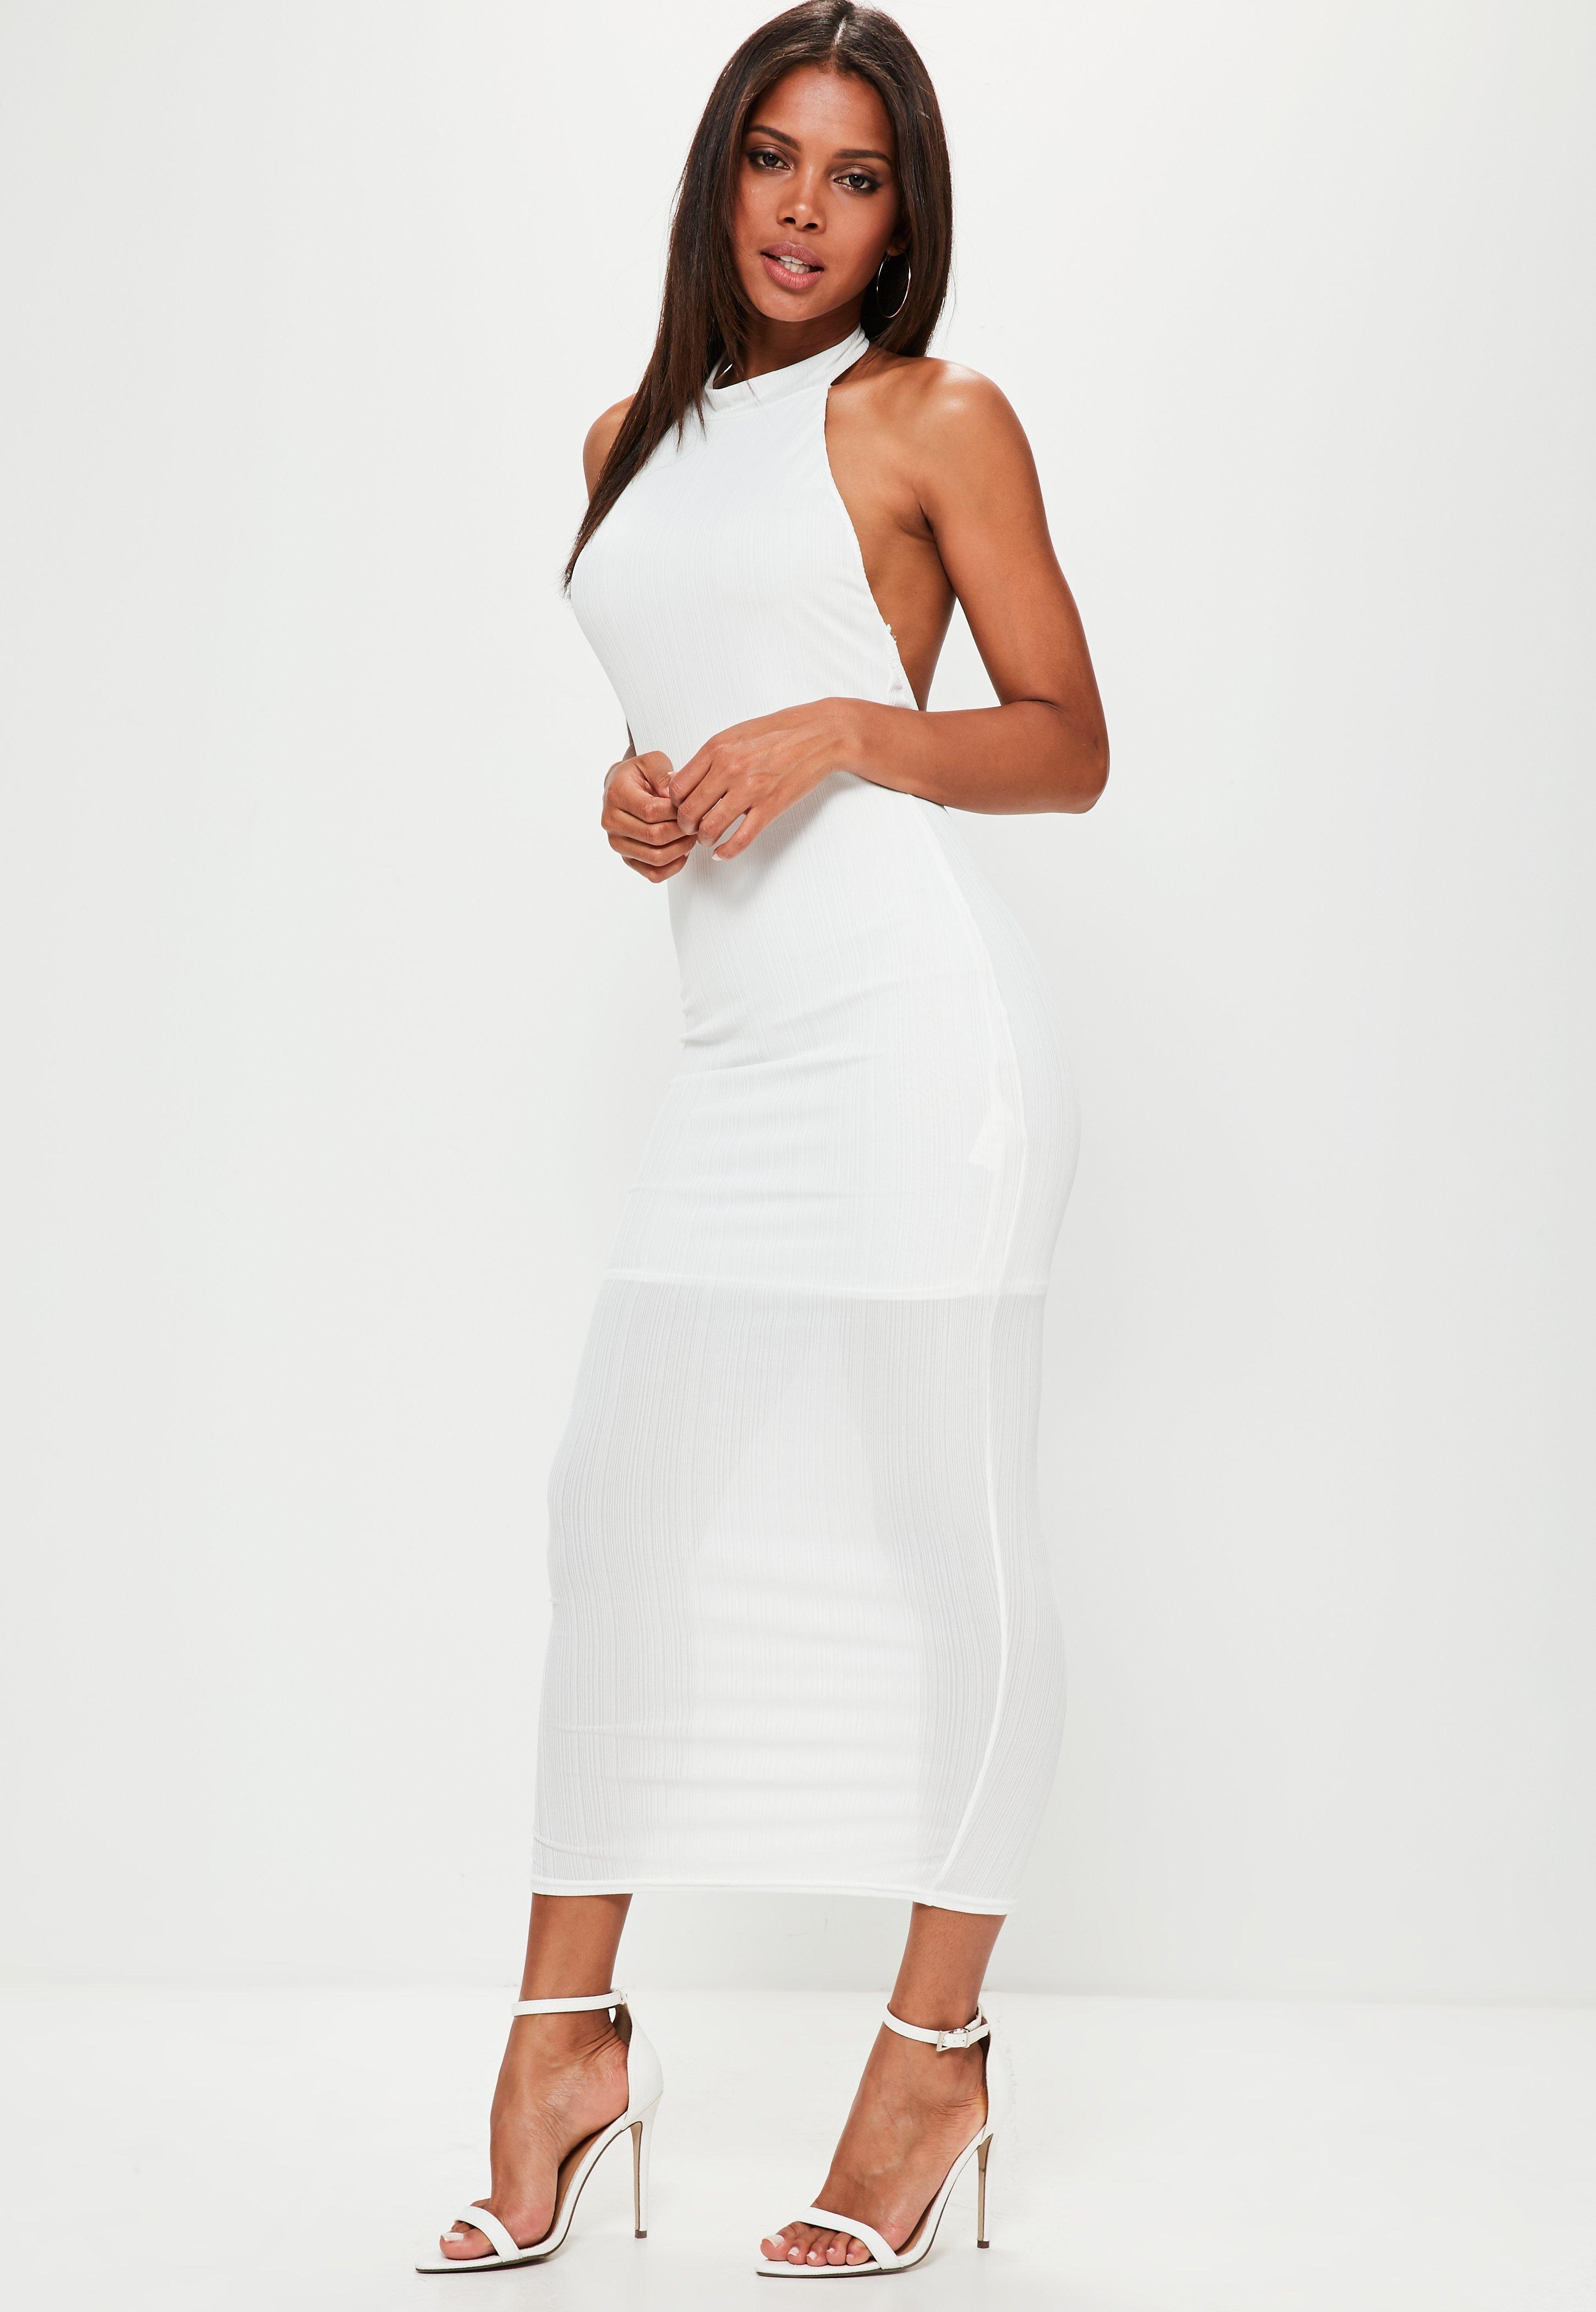 Floral mesh back maxi dress white long sleeve